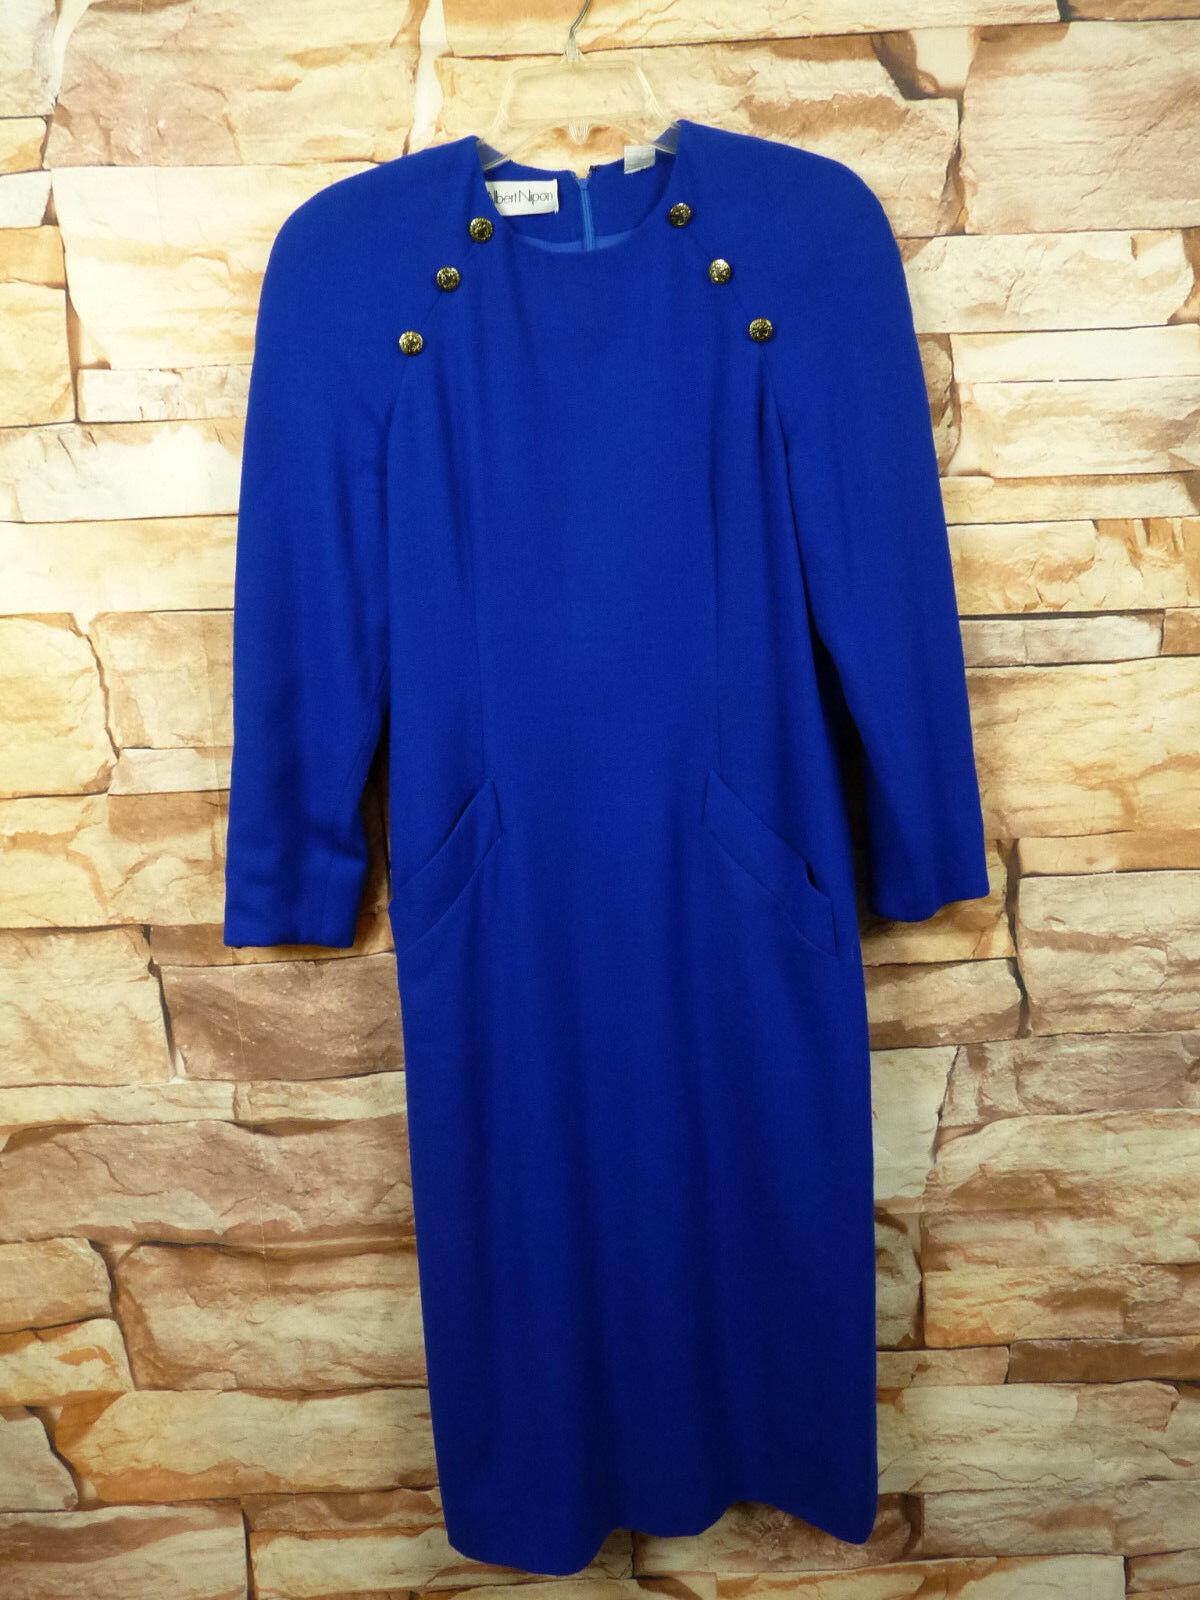 VIntage Albert Nipon Classy bluee Wool Dress, Front Buttons,Size  8